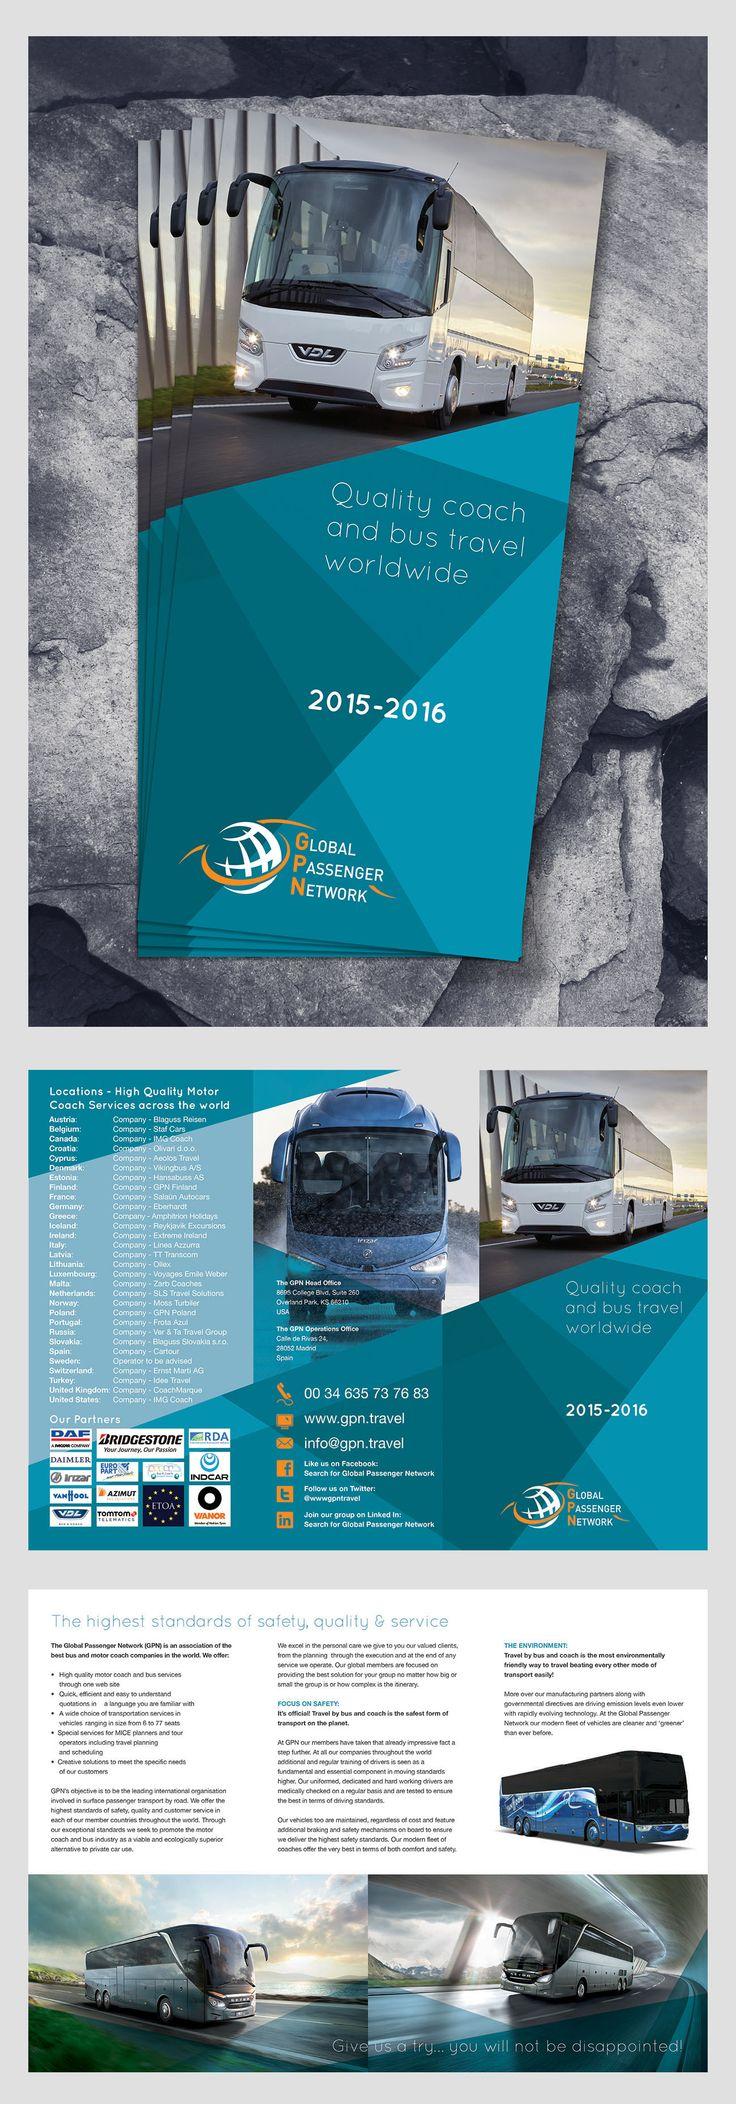 Global Passenger Network, 6pp, 1/3 A4 Leaflet